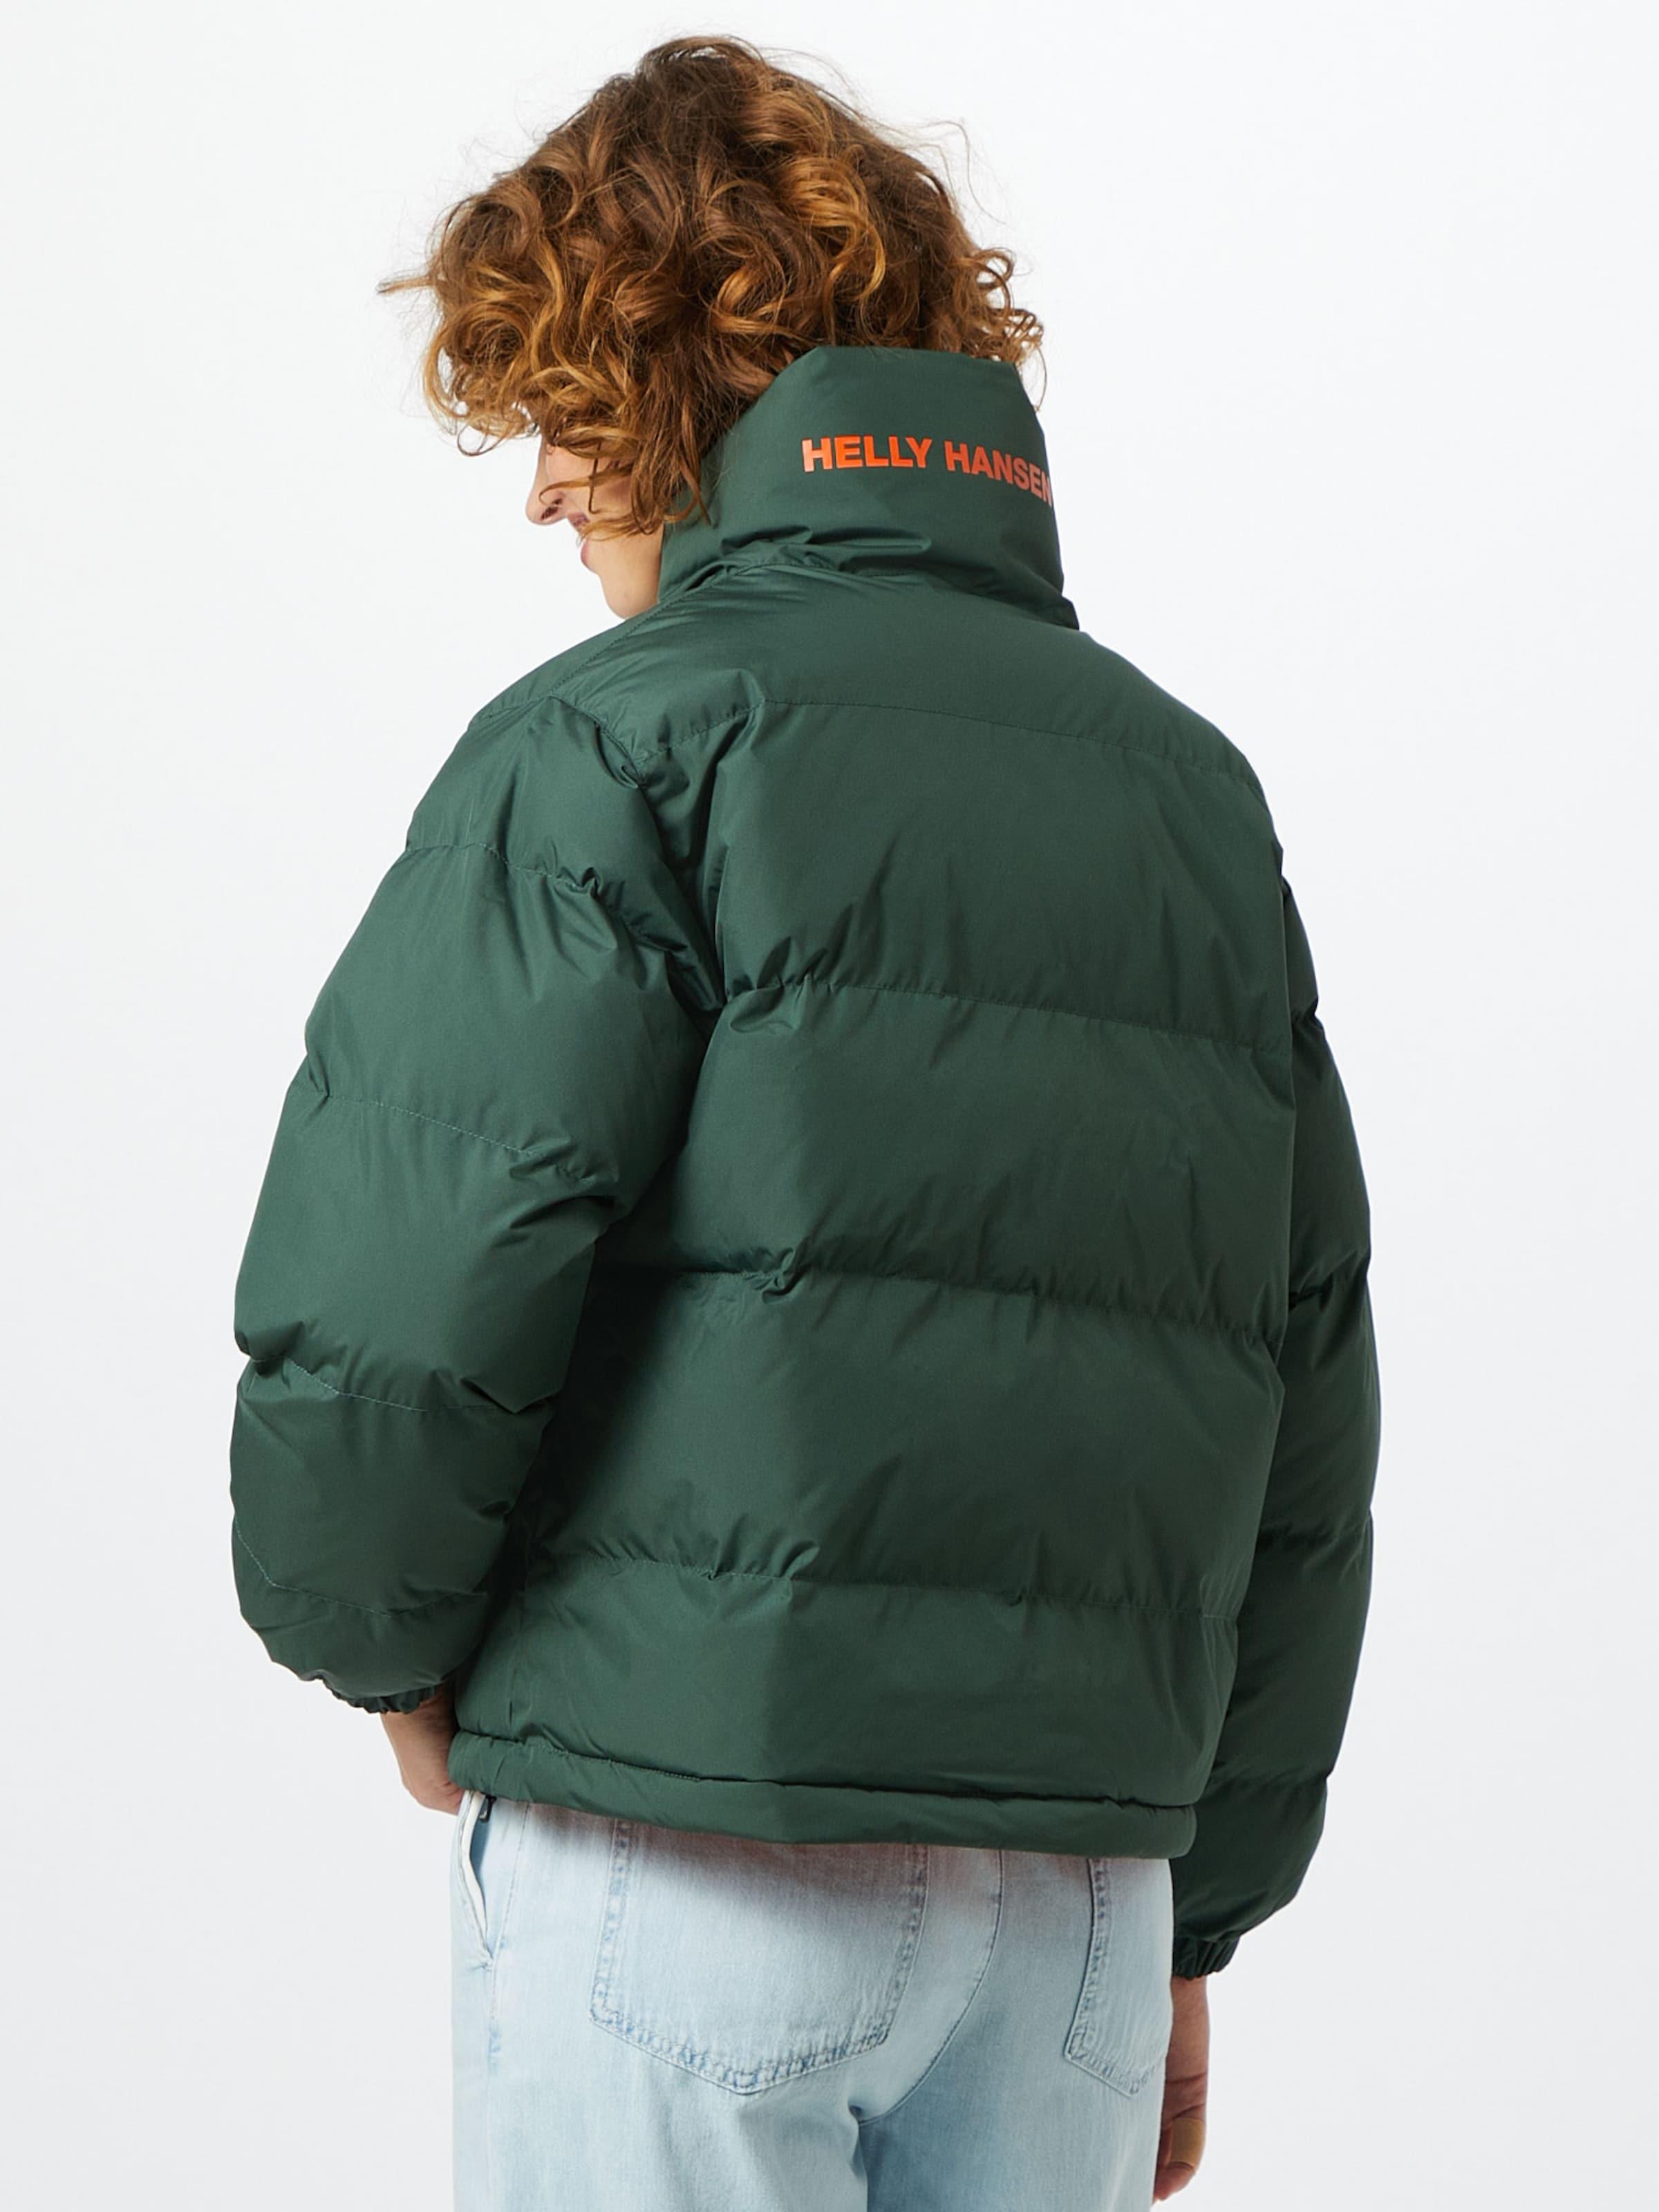 HELLY HANSEN Reversible Jacke 'Urban' in grün / orange